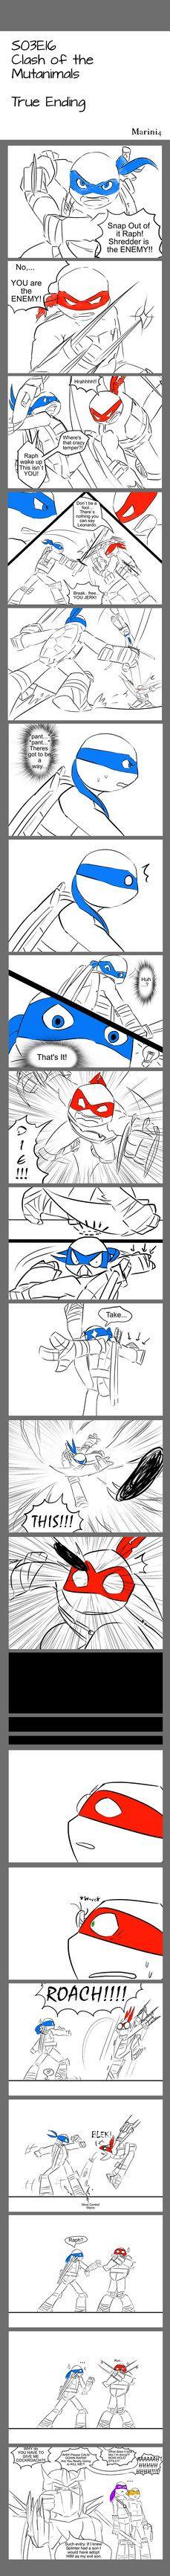 TMNT comic 1 - Clash of Mutanimals TRUE ENDING by Marini4 on DeviantArt